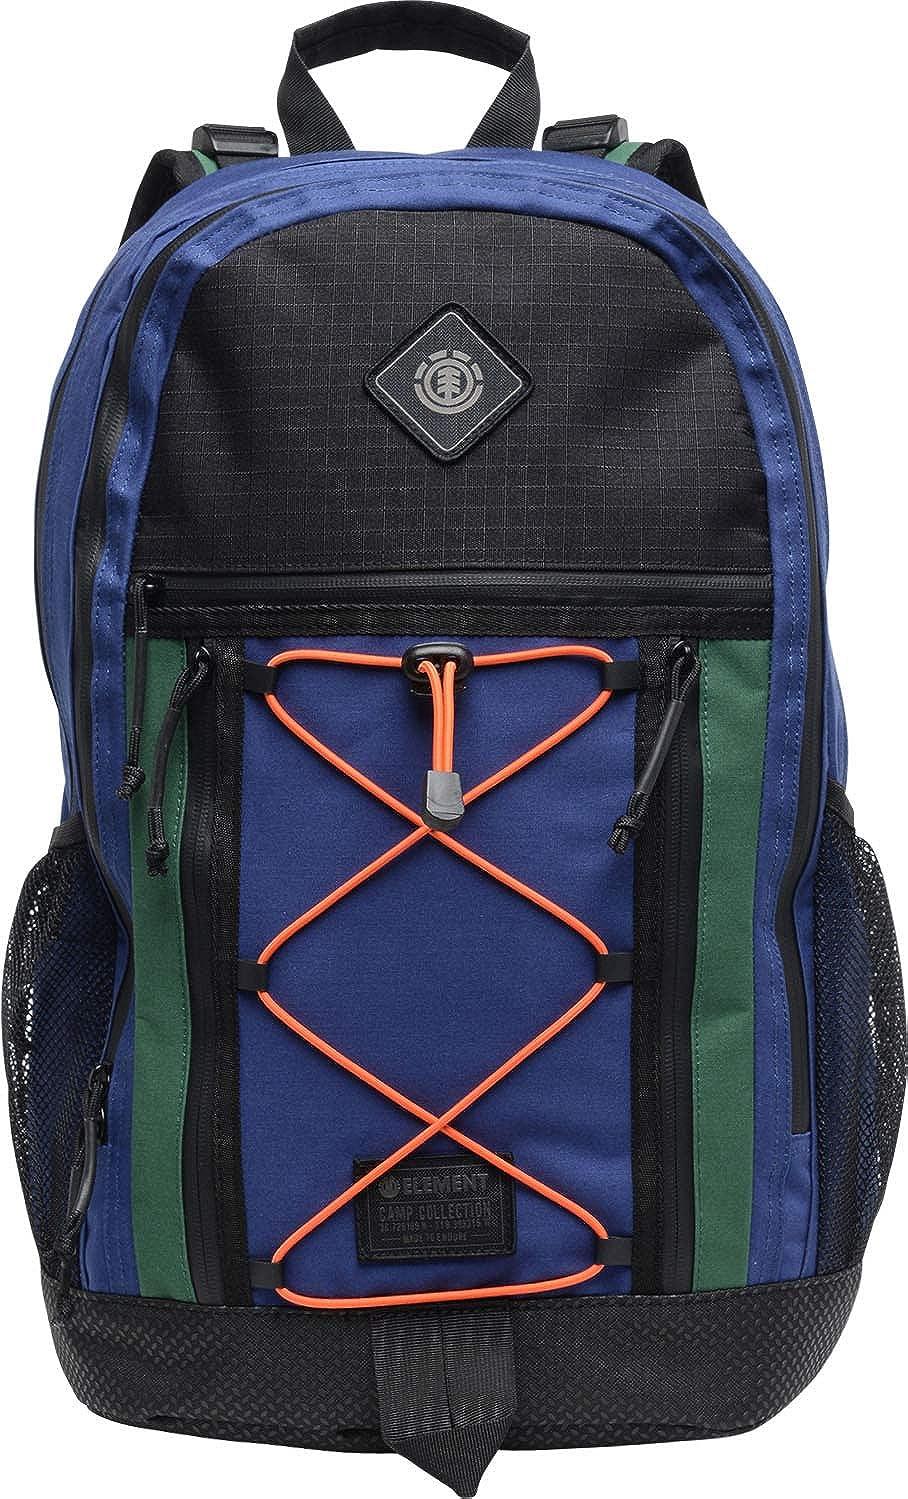 Element Cypress Outward Backpack